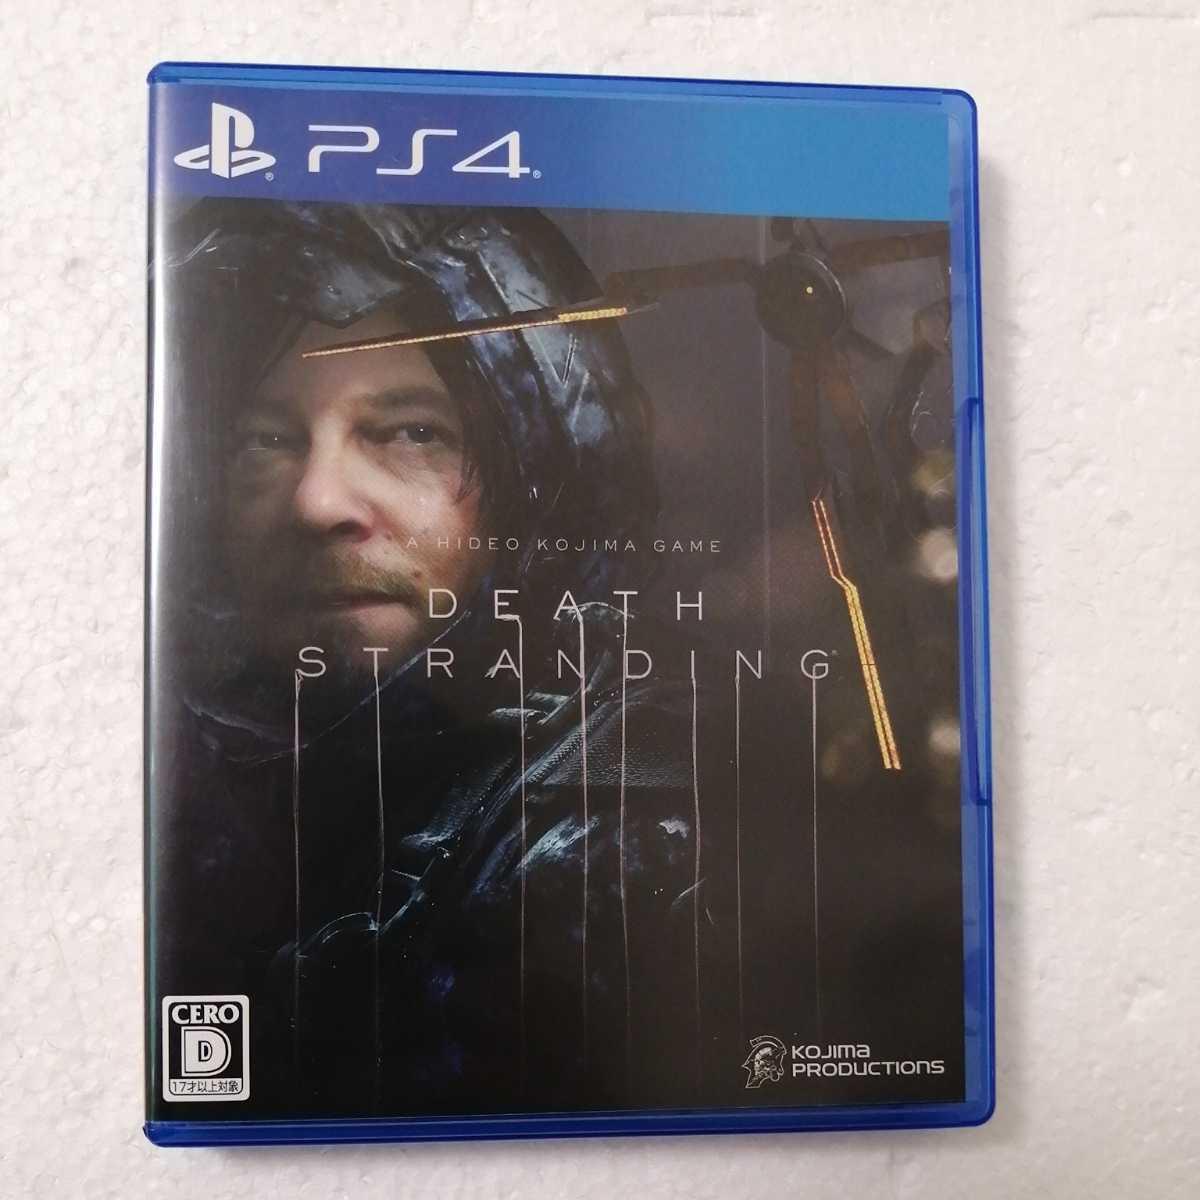 PS4 DEATH STRANDING 通常版 デスストランディング プレイステーション4ソフト